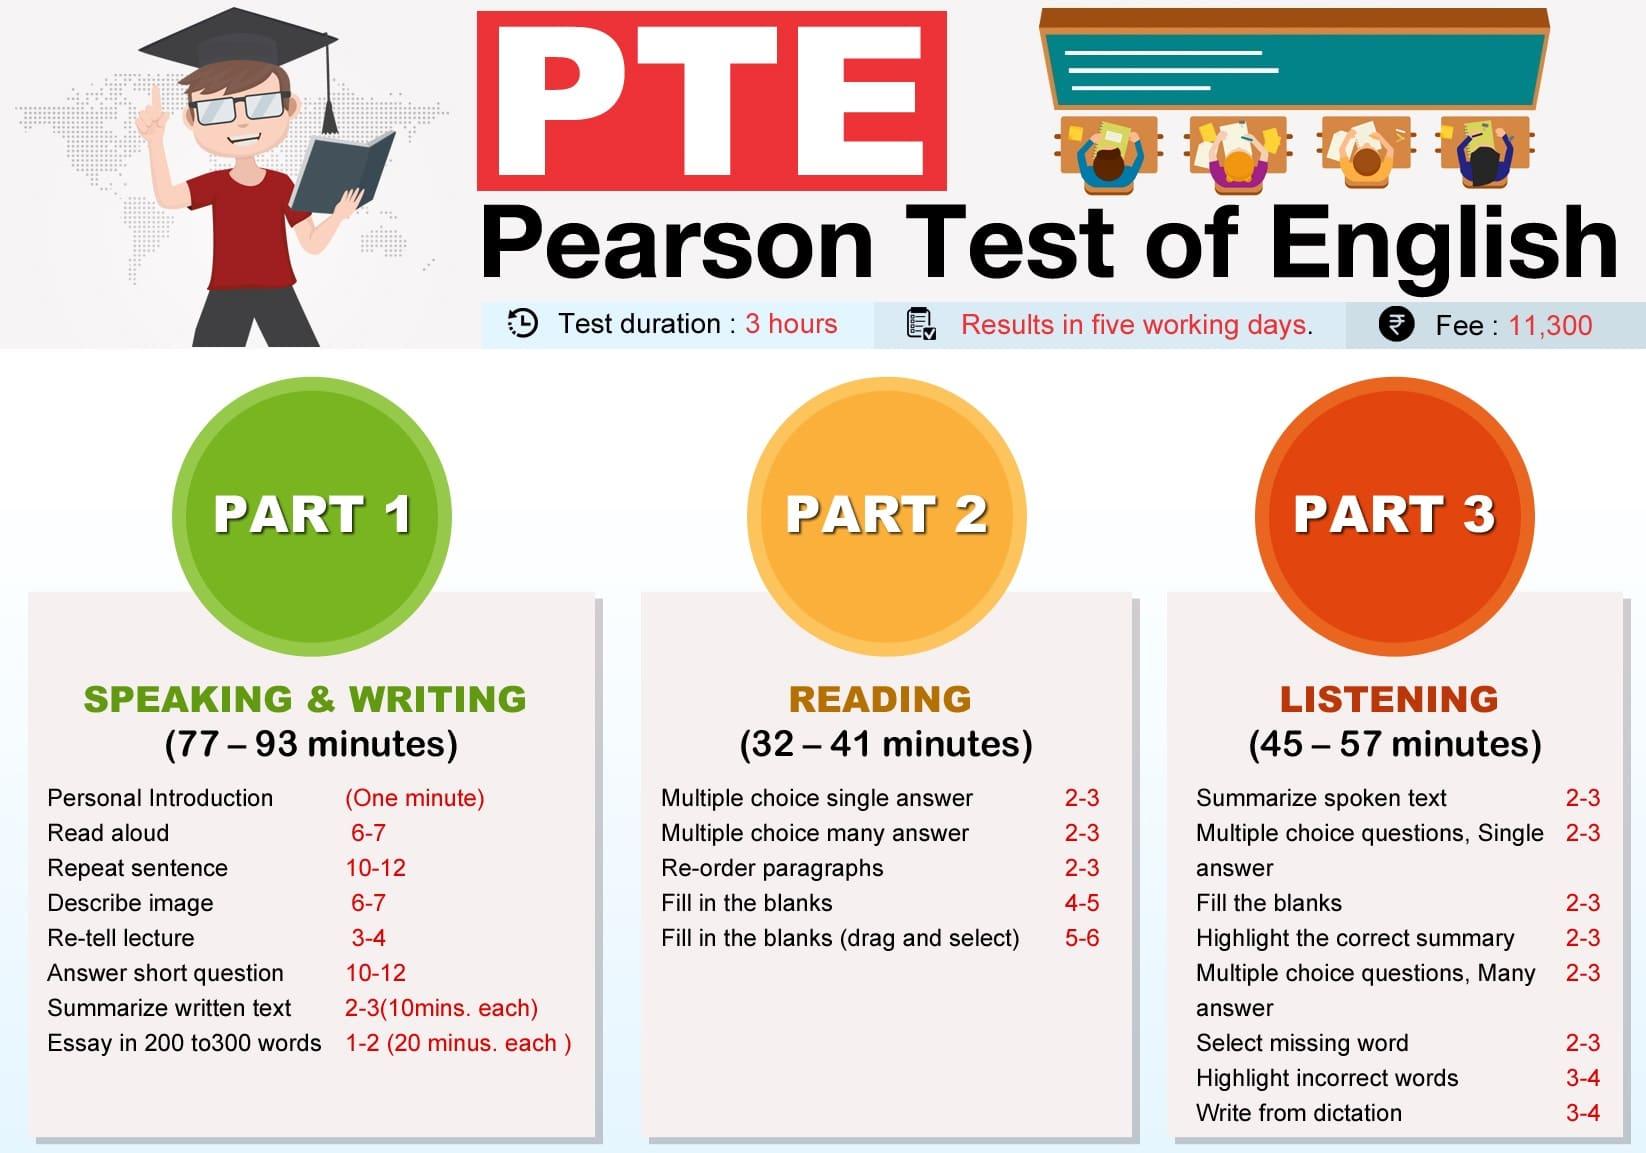 ساختار آزمون PTE